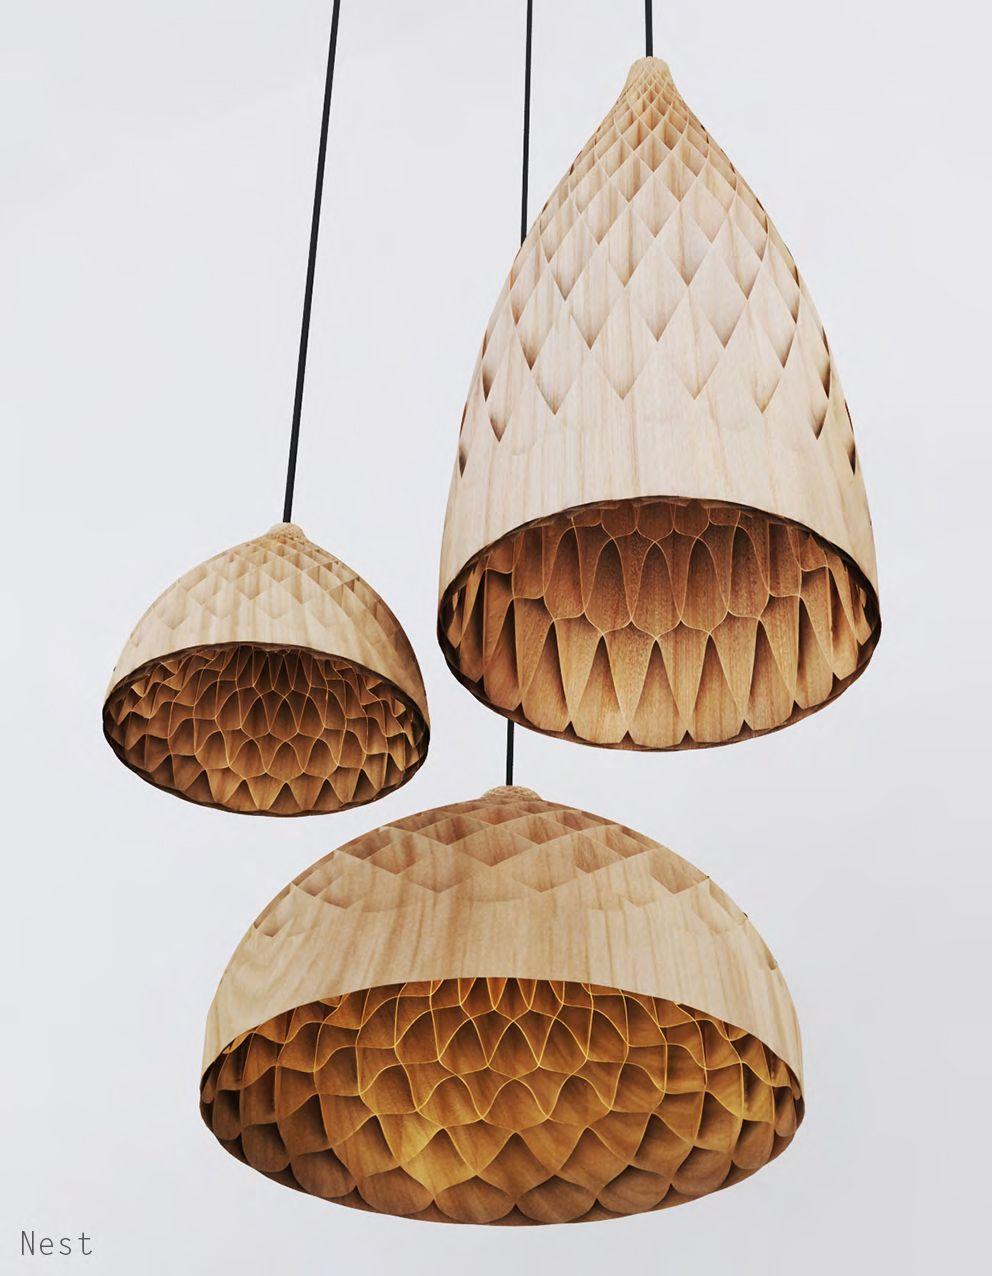 Edward Linacre's Beautiful Honeycomb Nest Lamp Packs Flat to Ship - Edward Linacre's Beautiful Honeycomb Nest Lamp Packs Flat To Ship